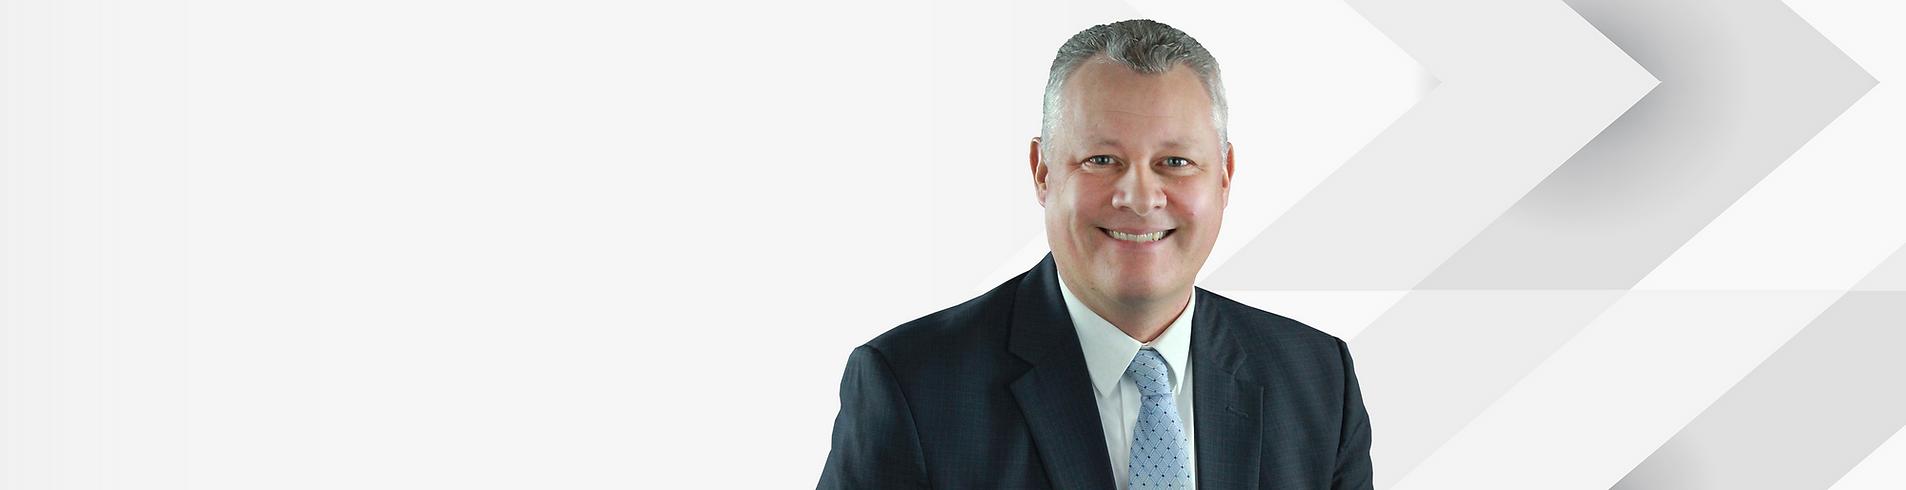 Jason Livingston, Trusts & Estates Attorney in Rochester NY